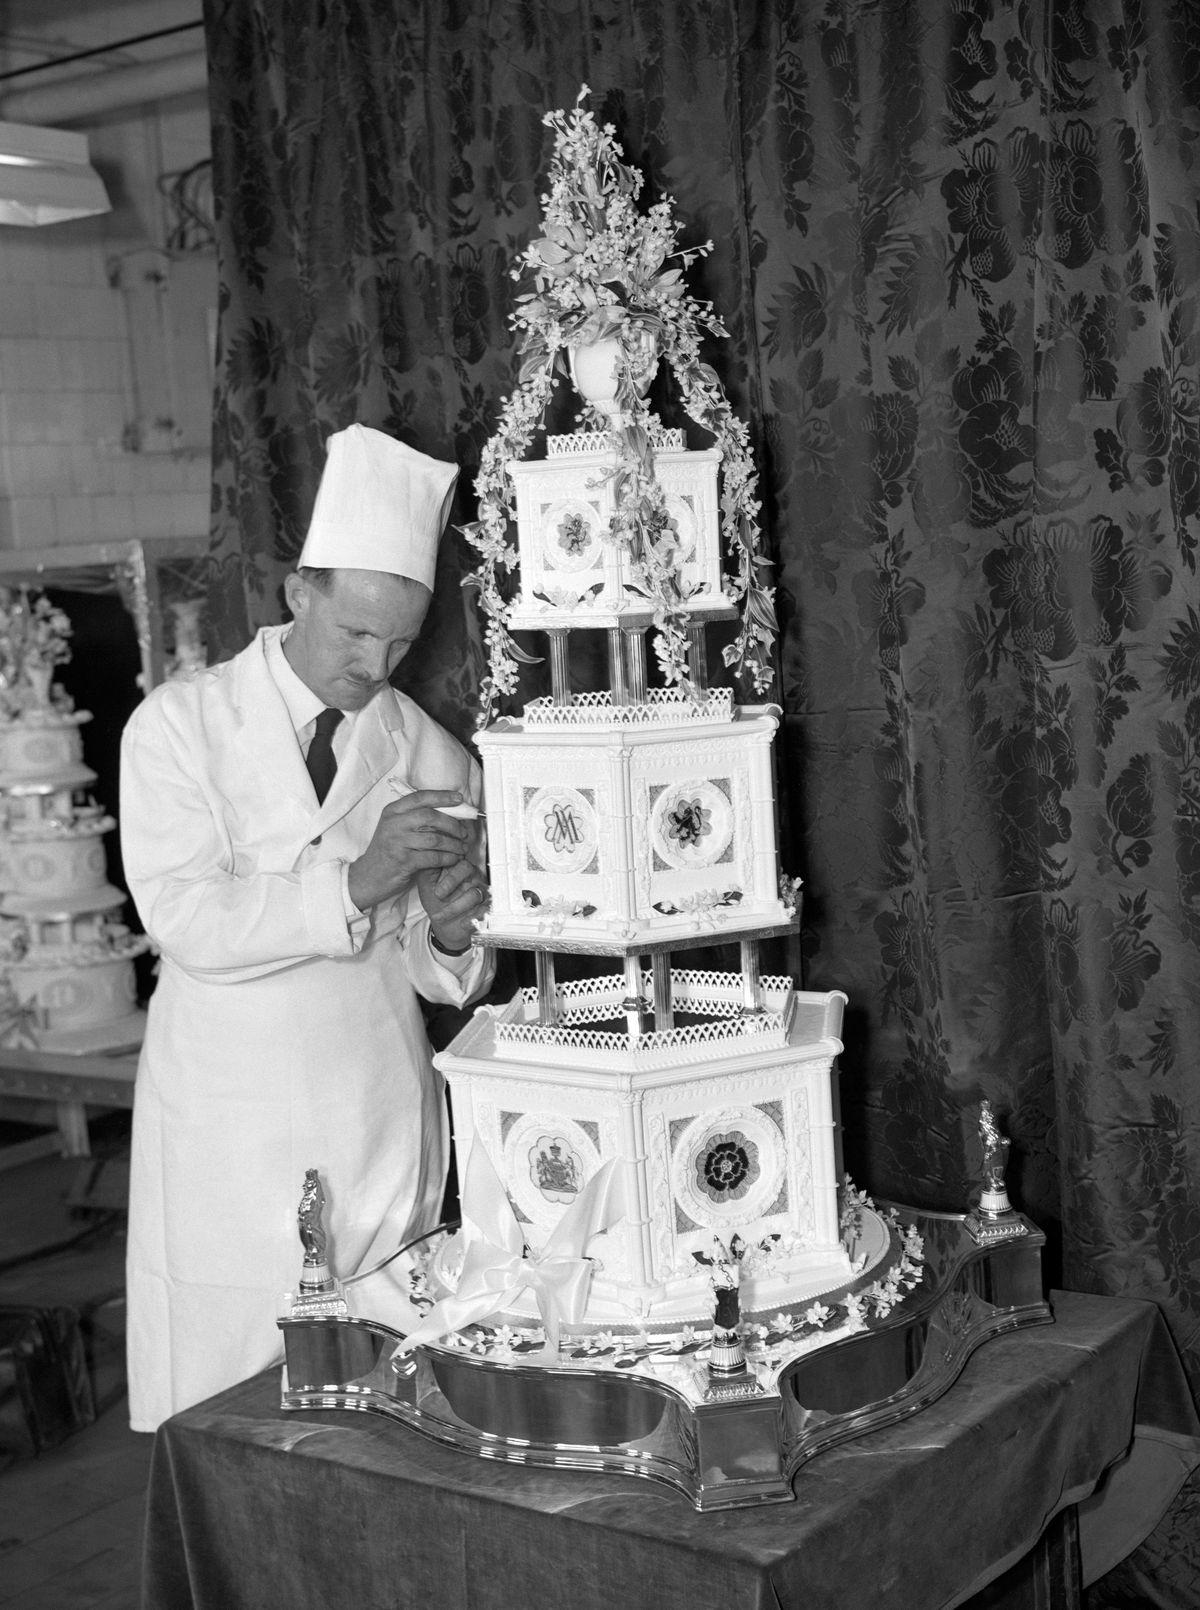 Wedding cake for Princess Margaret